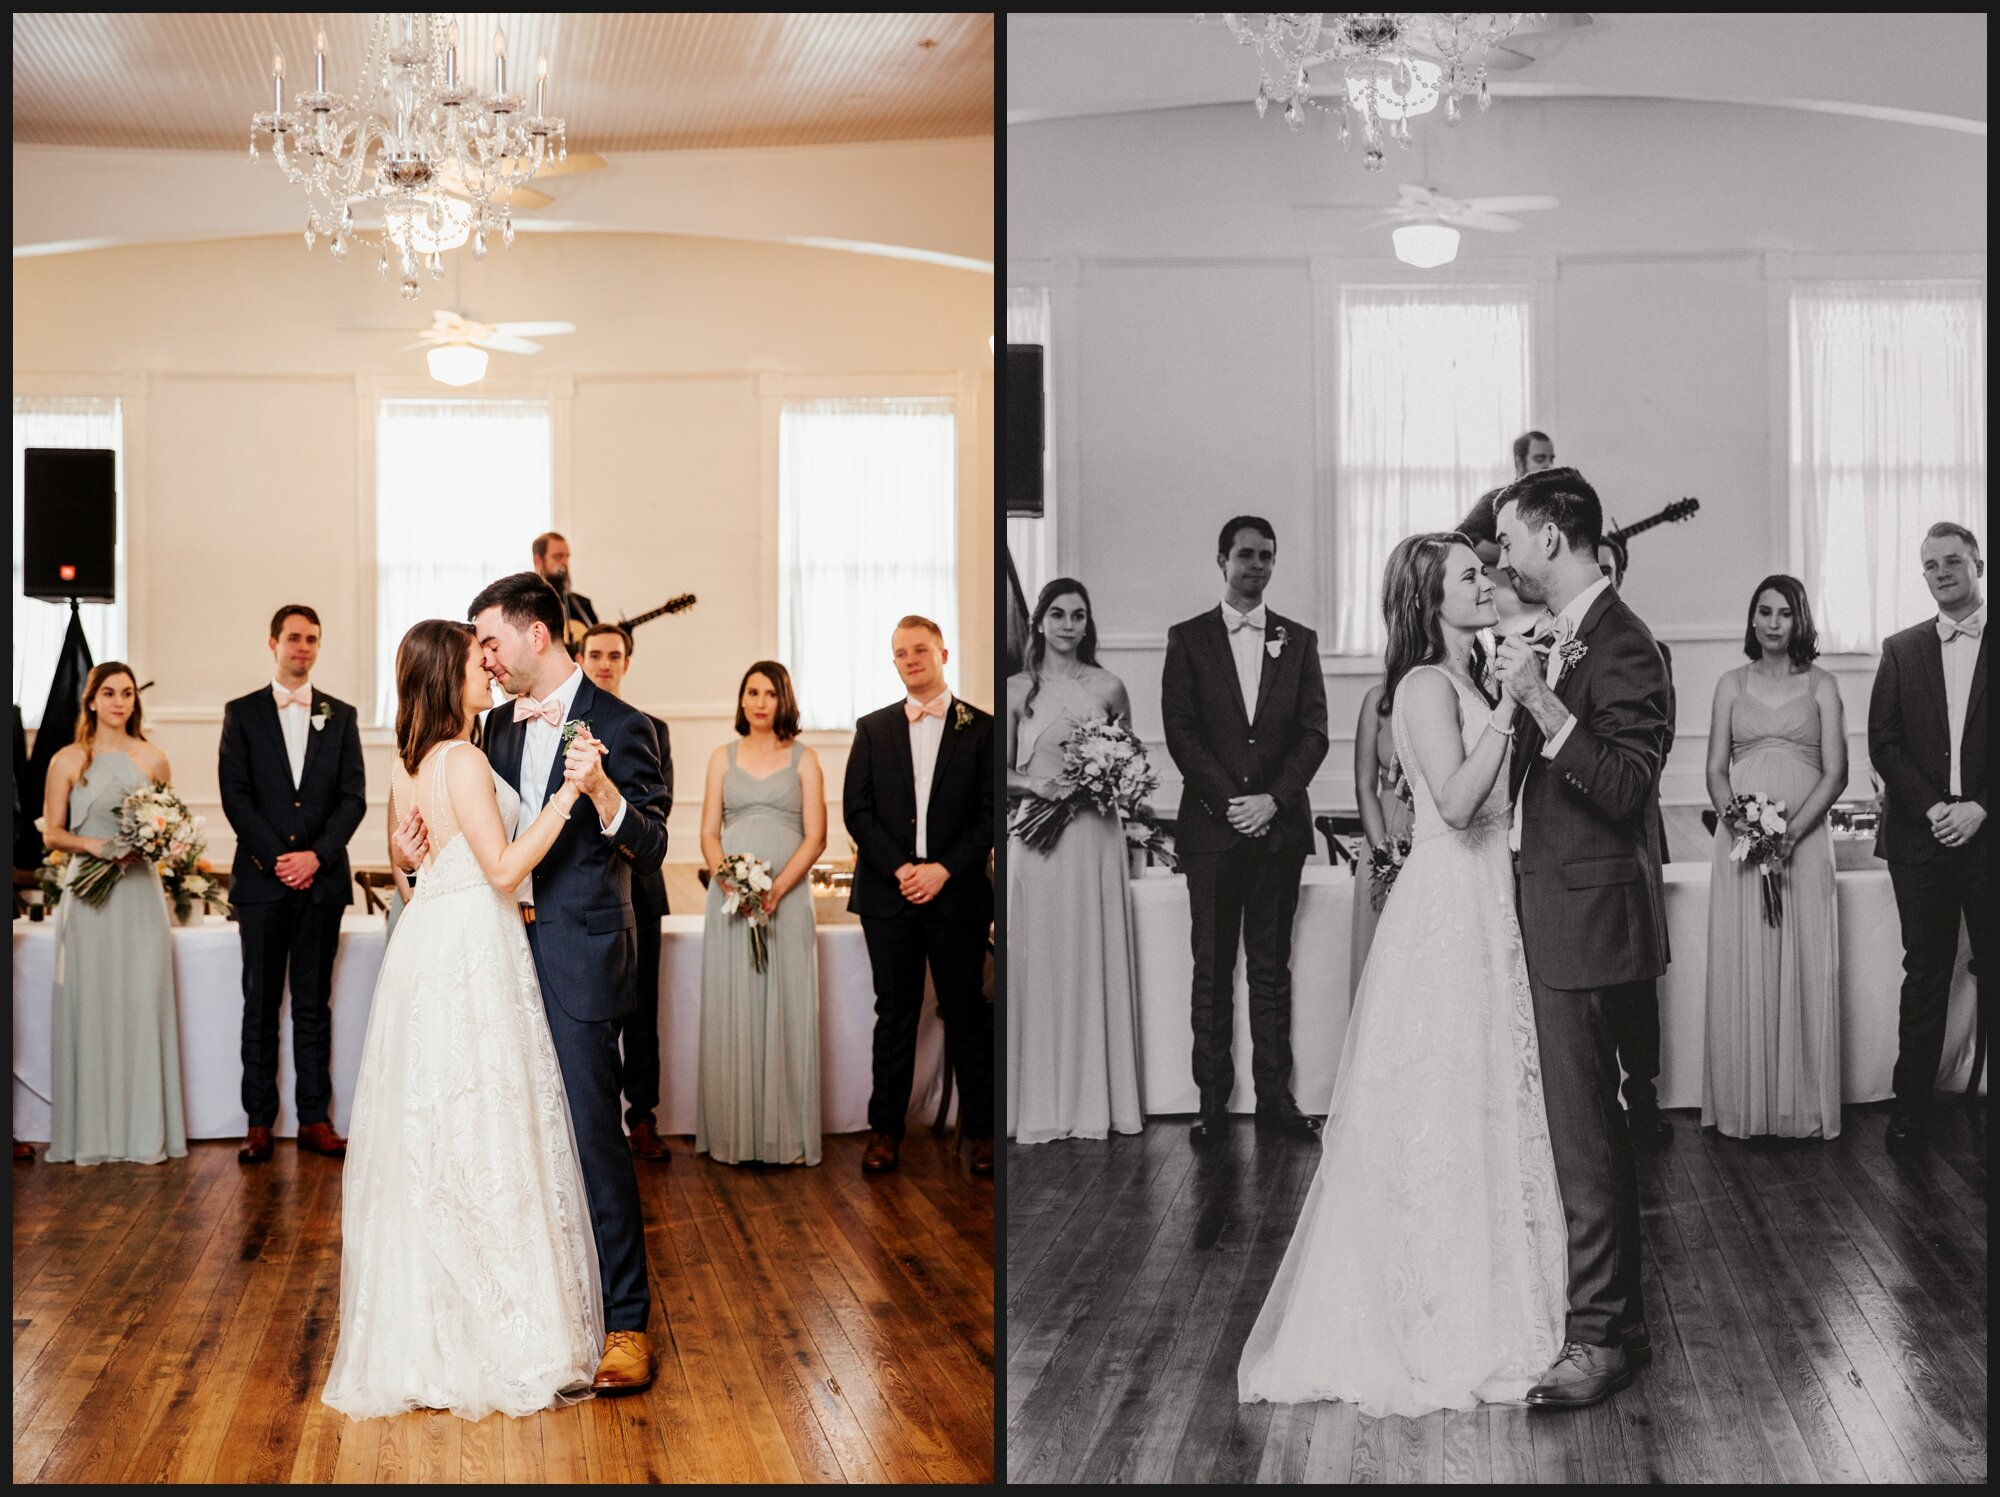 Orlando-Wedding-Photographer-destination-wedding-photographer-florida-wedding-photographer-hawaii-wedding-photographer_0635.jpg